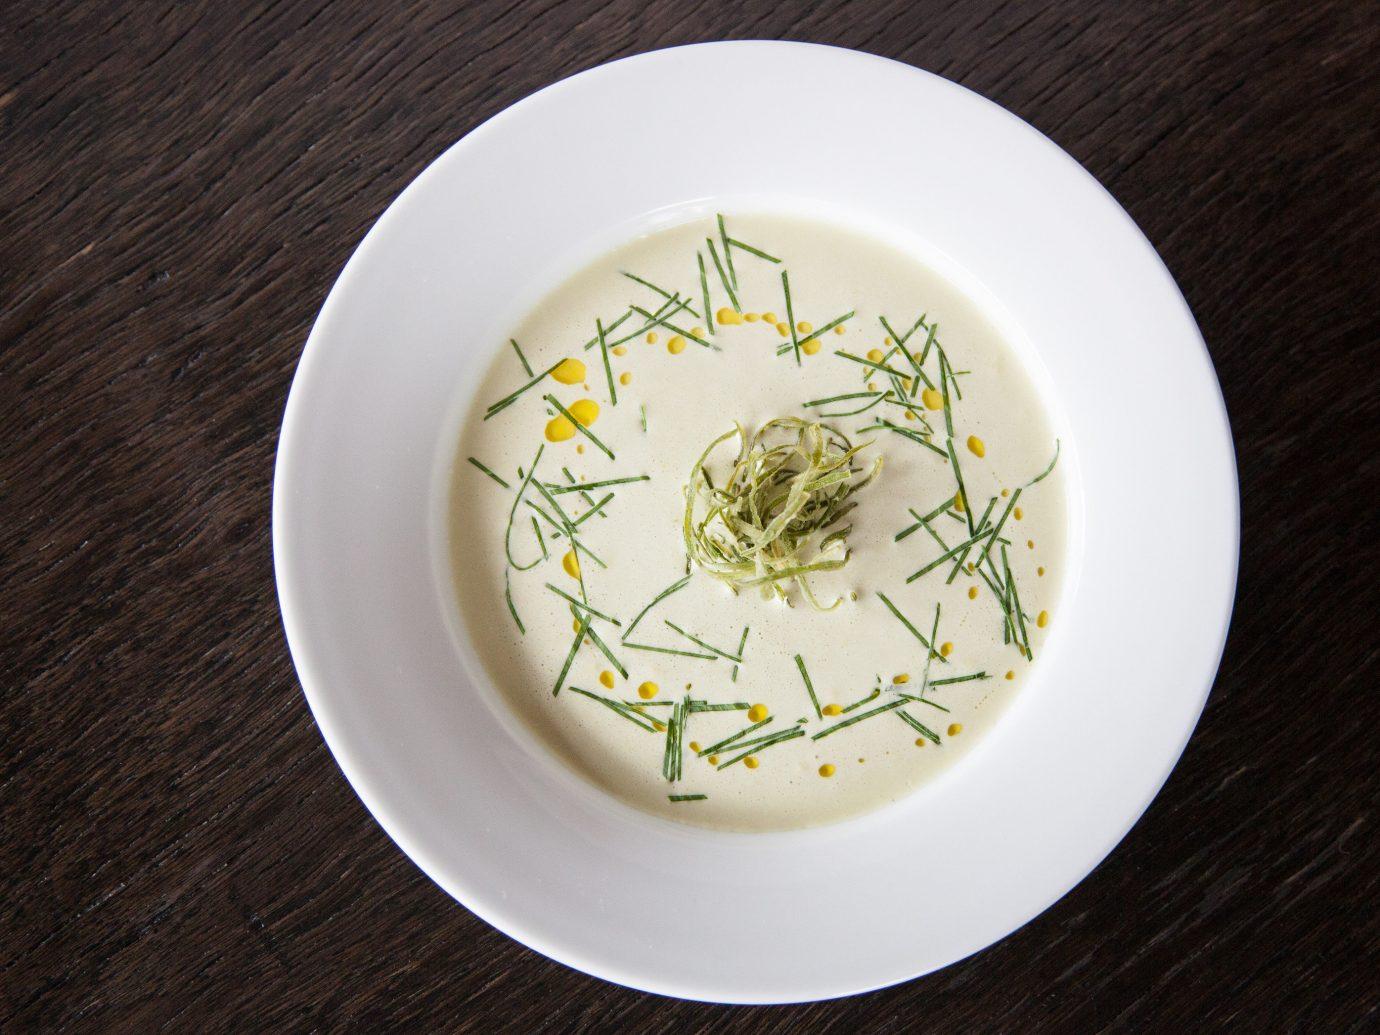 Jetsetter Guides plate table indoor food saucer cup porcelain art ceramic produce dishware flower tableware dish soup